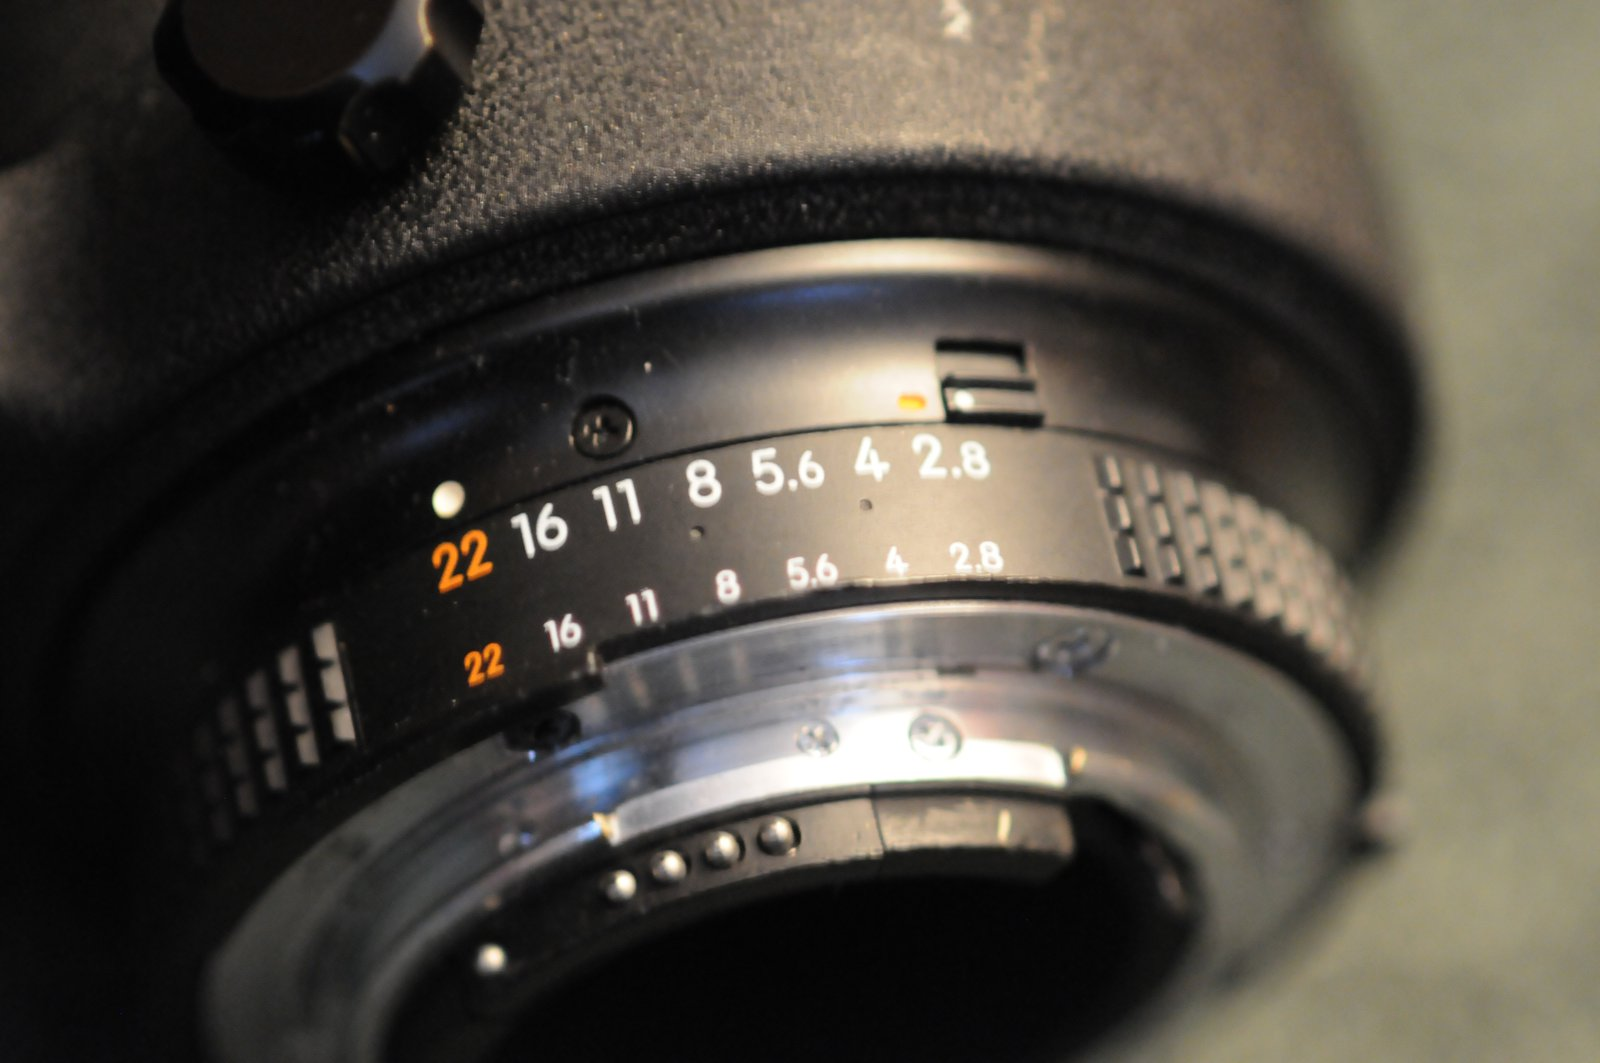 NIKON lens for sale